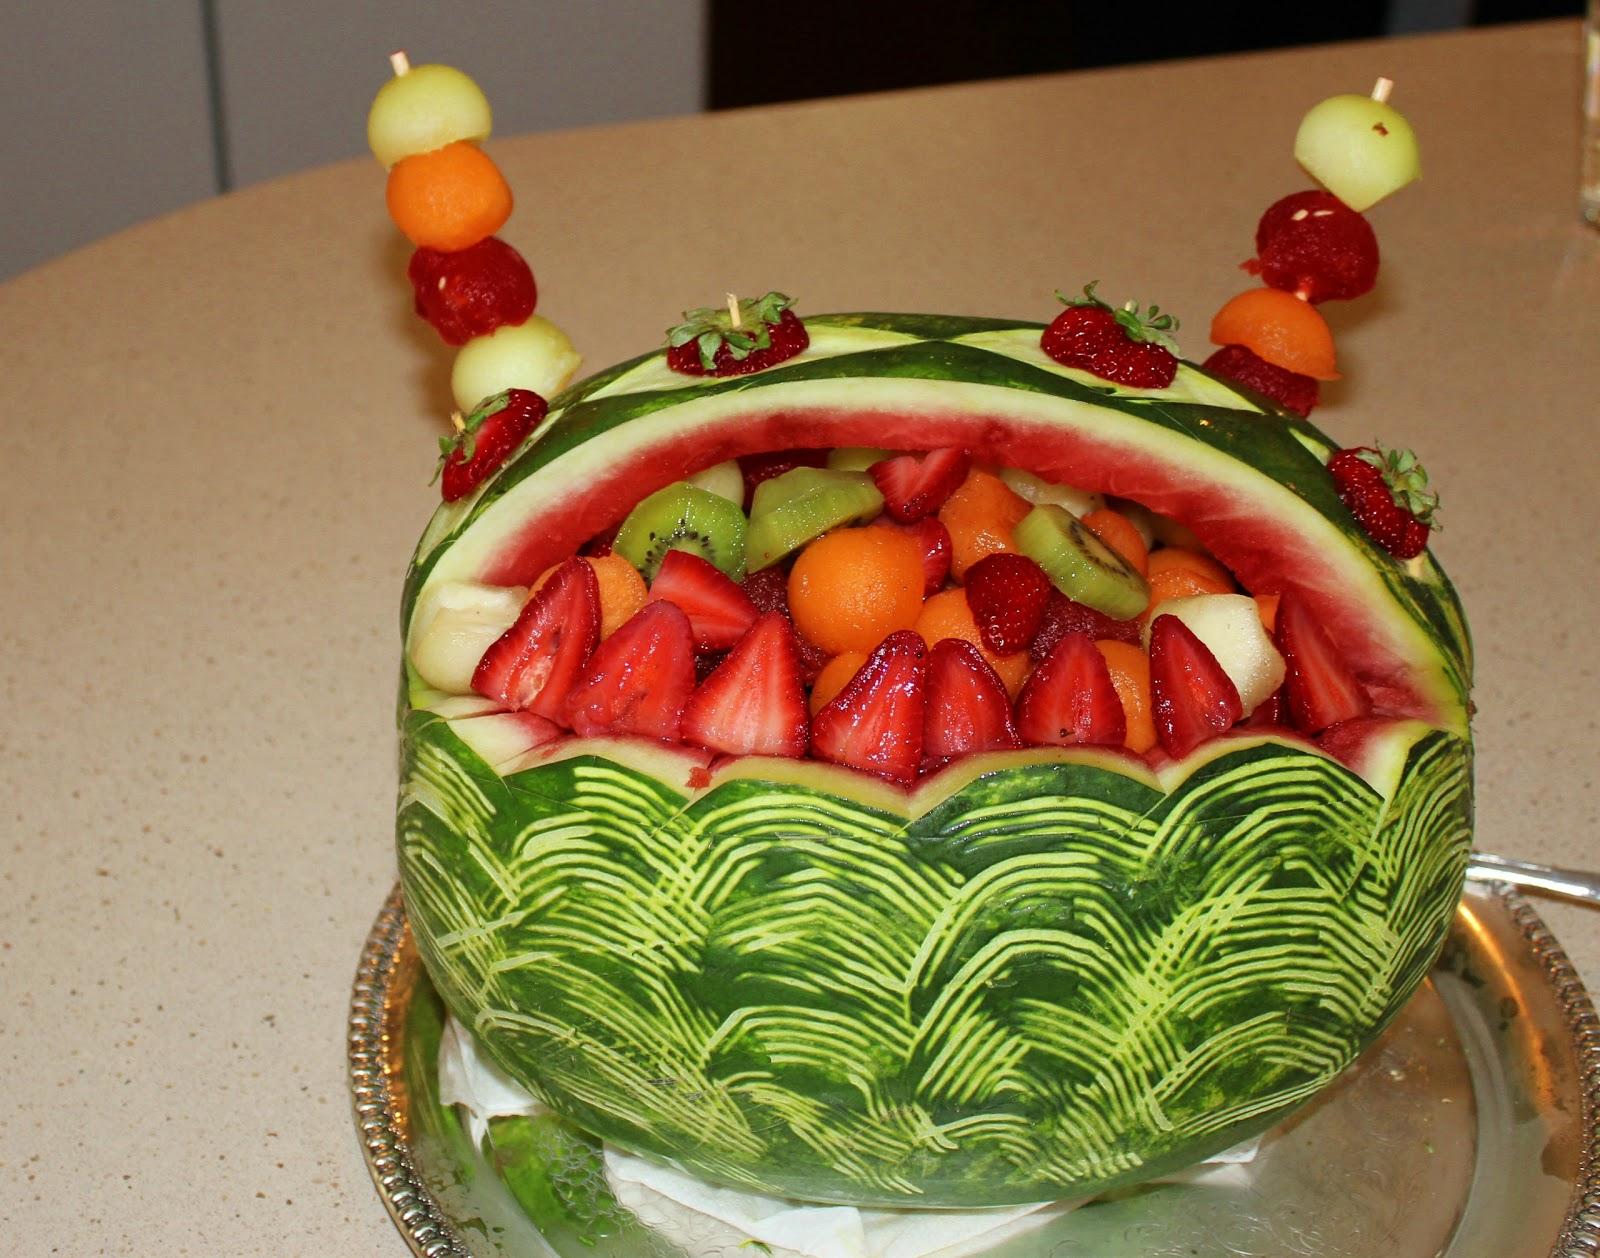 My Cool Kid Cooks: Teens Fruit Salad Basket Carving Idea ...